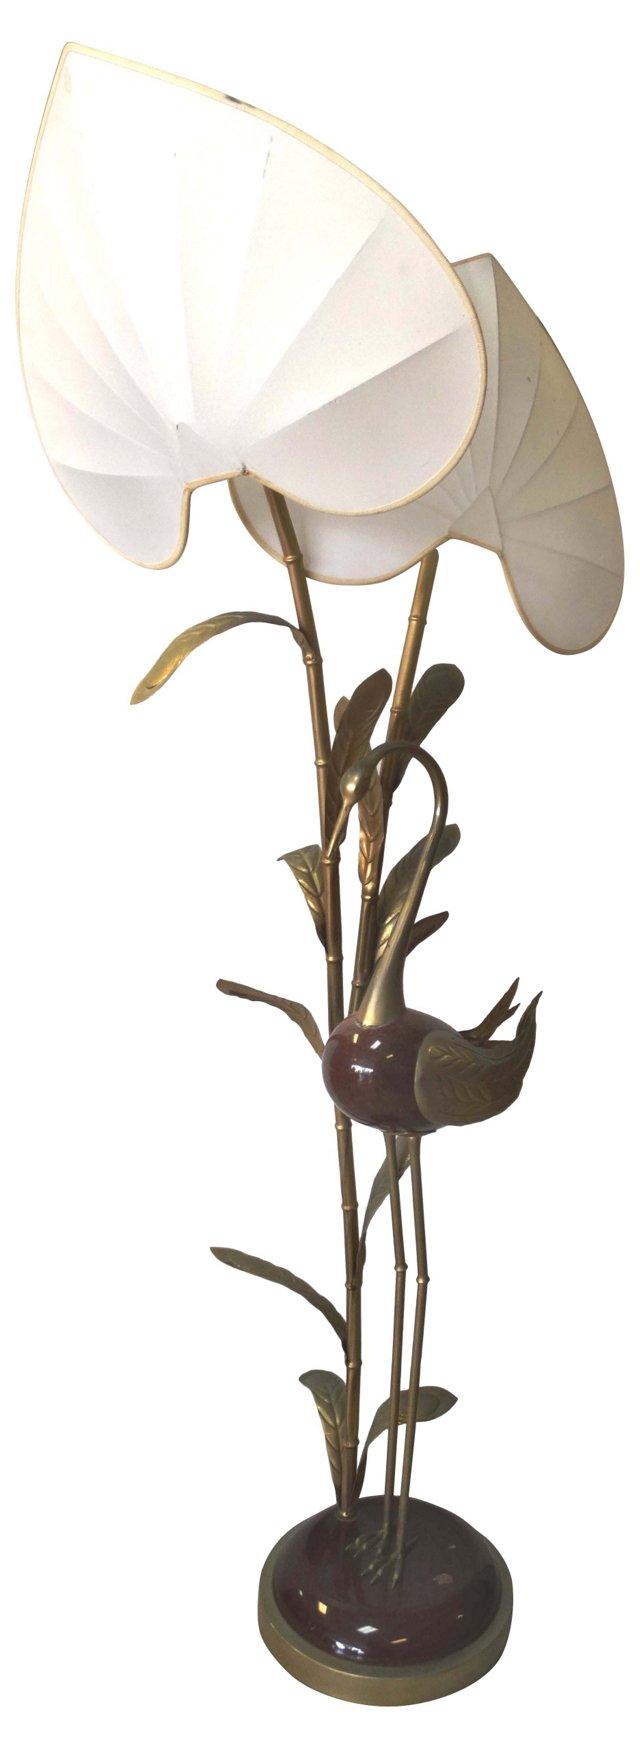 Antonio Pavia Bird Sculpture Floor Lamp